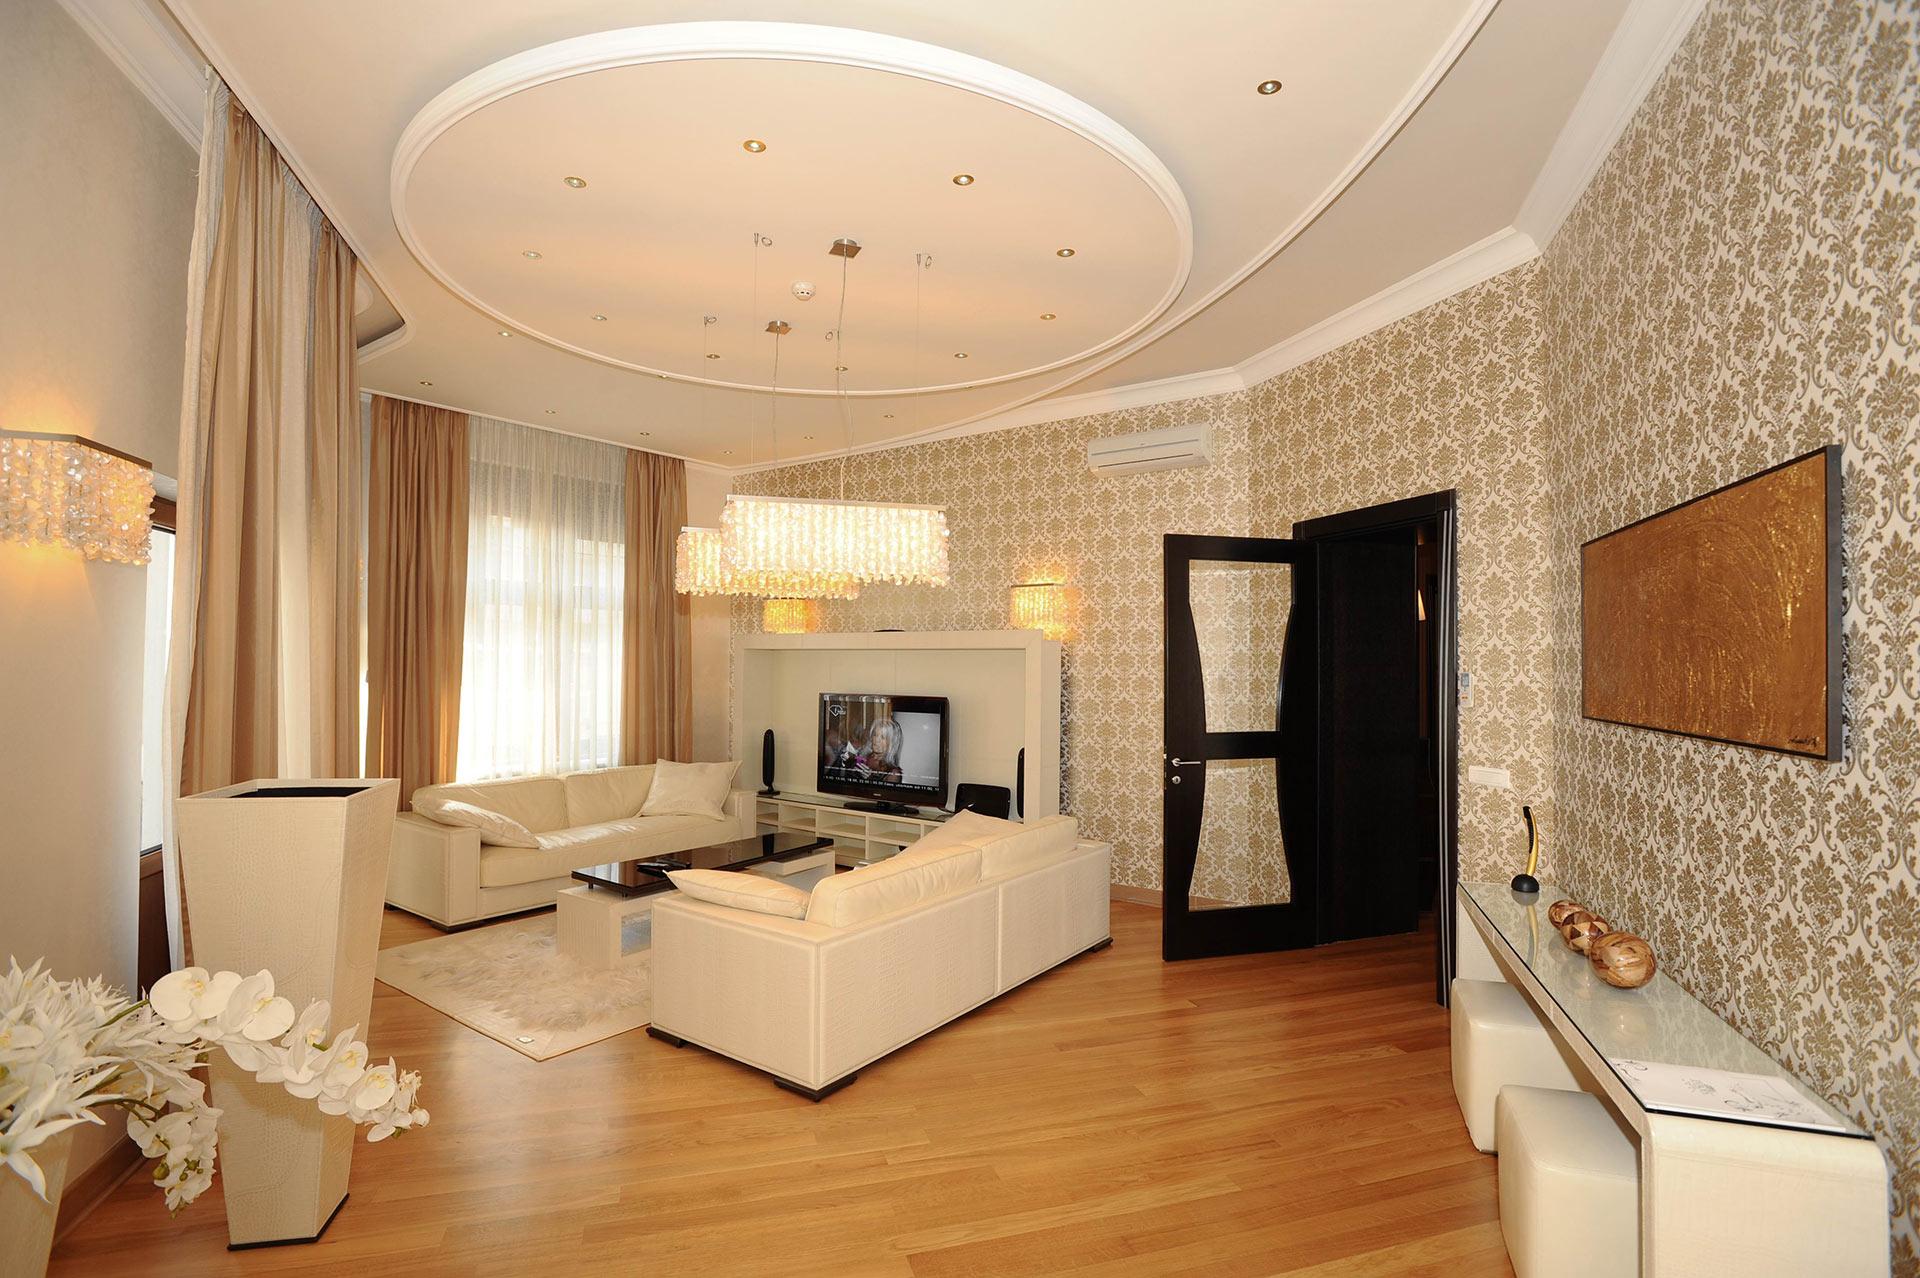 Projekat Hotel Evropa